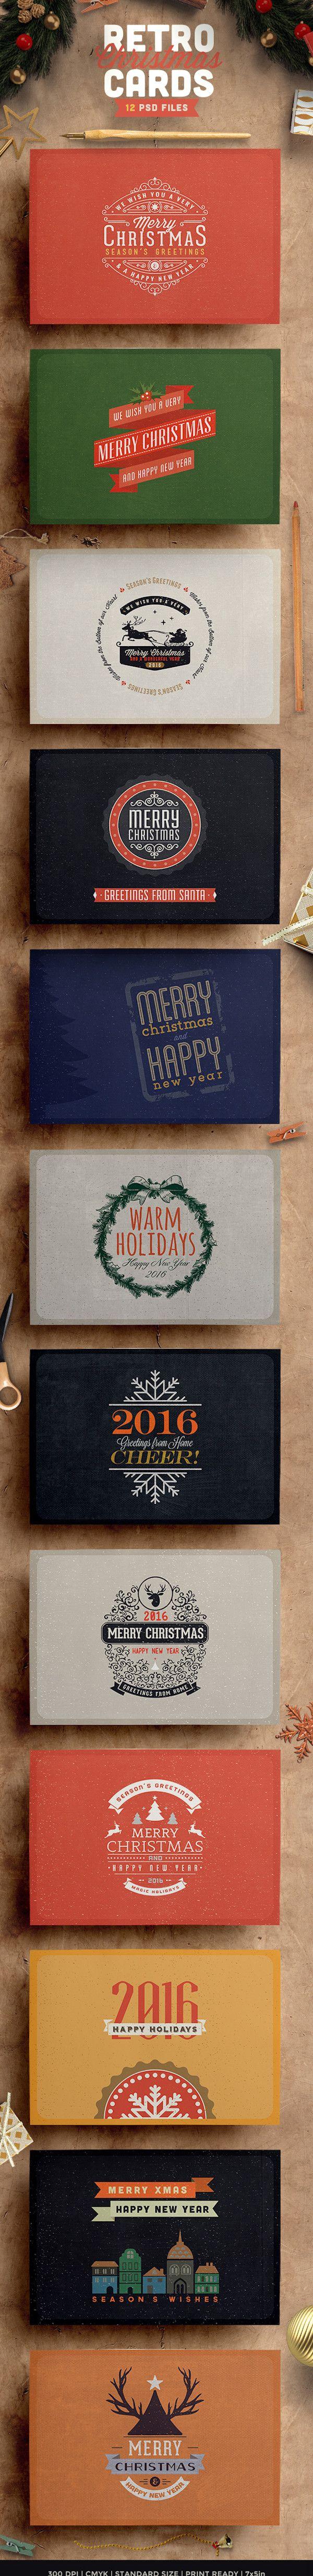 20+ Creative Christmas Card Designs for Inspiration